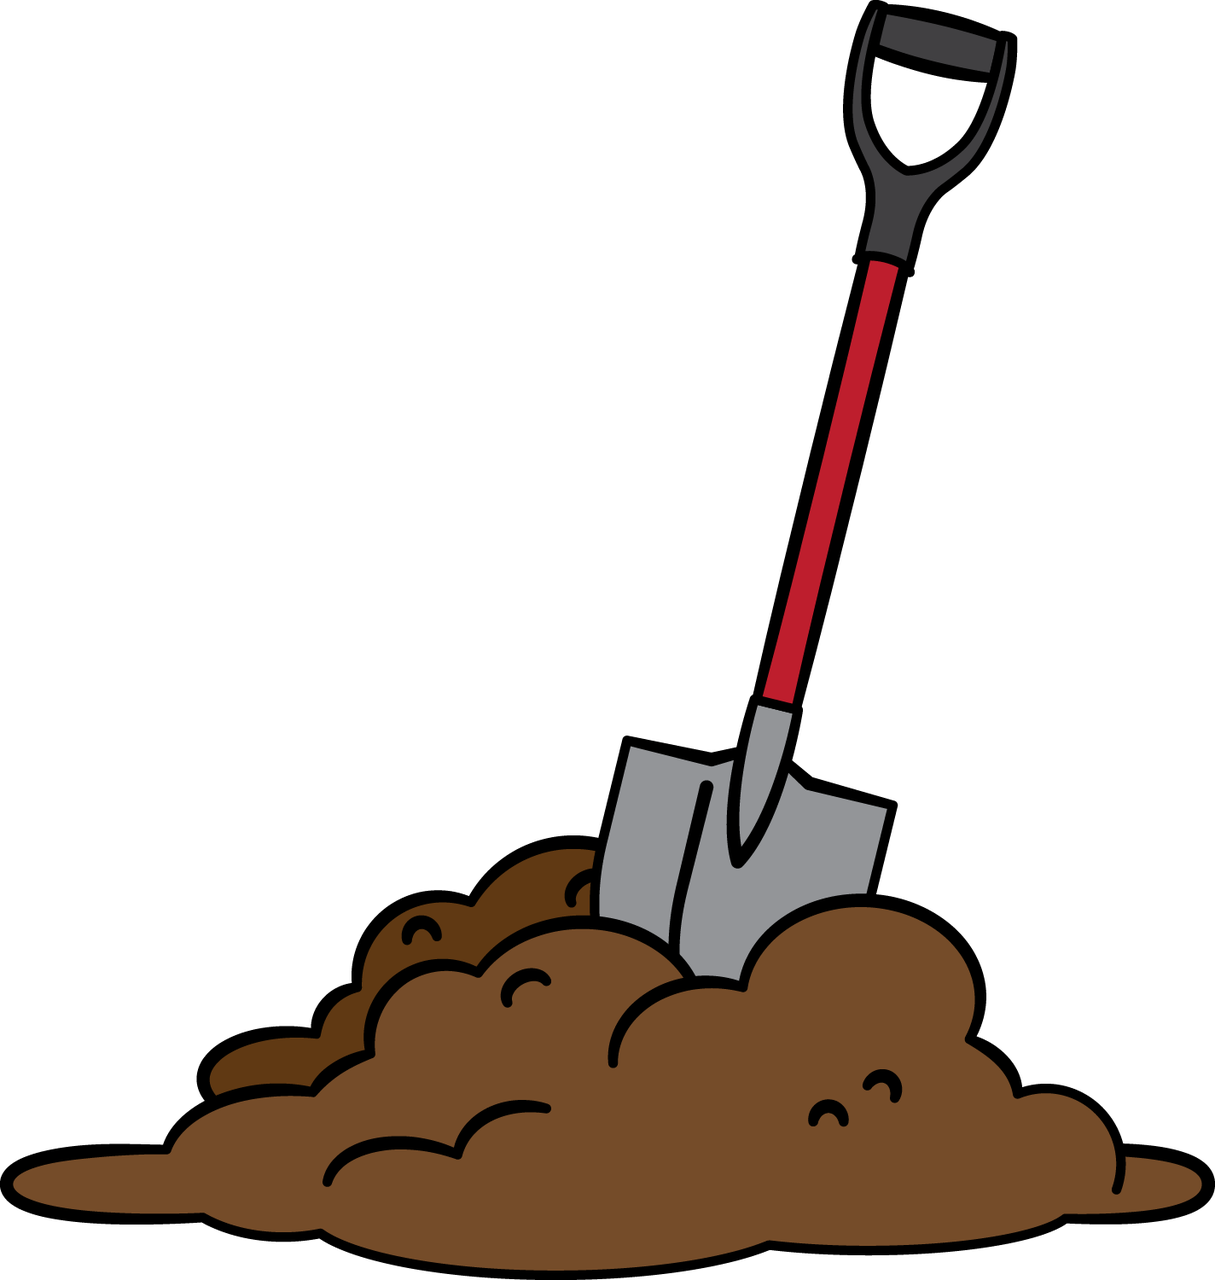 Dig clipart wanton. Digging dirt angel moroni